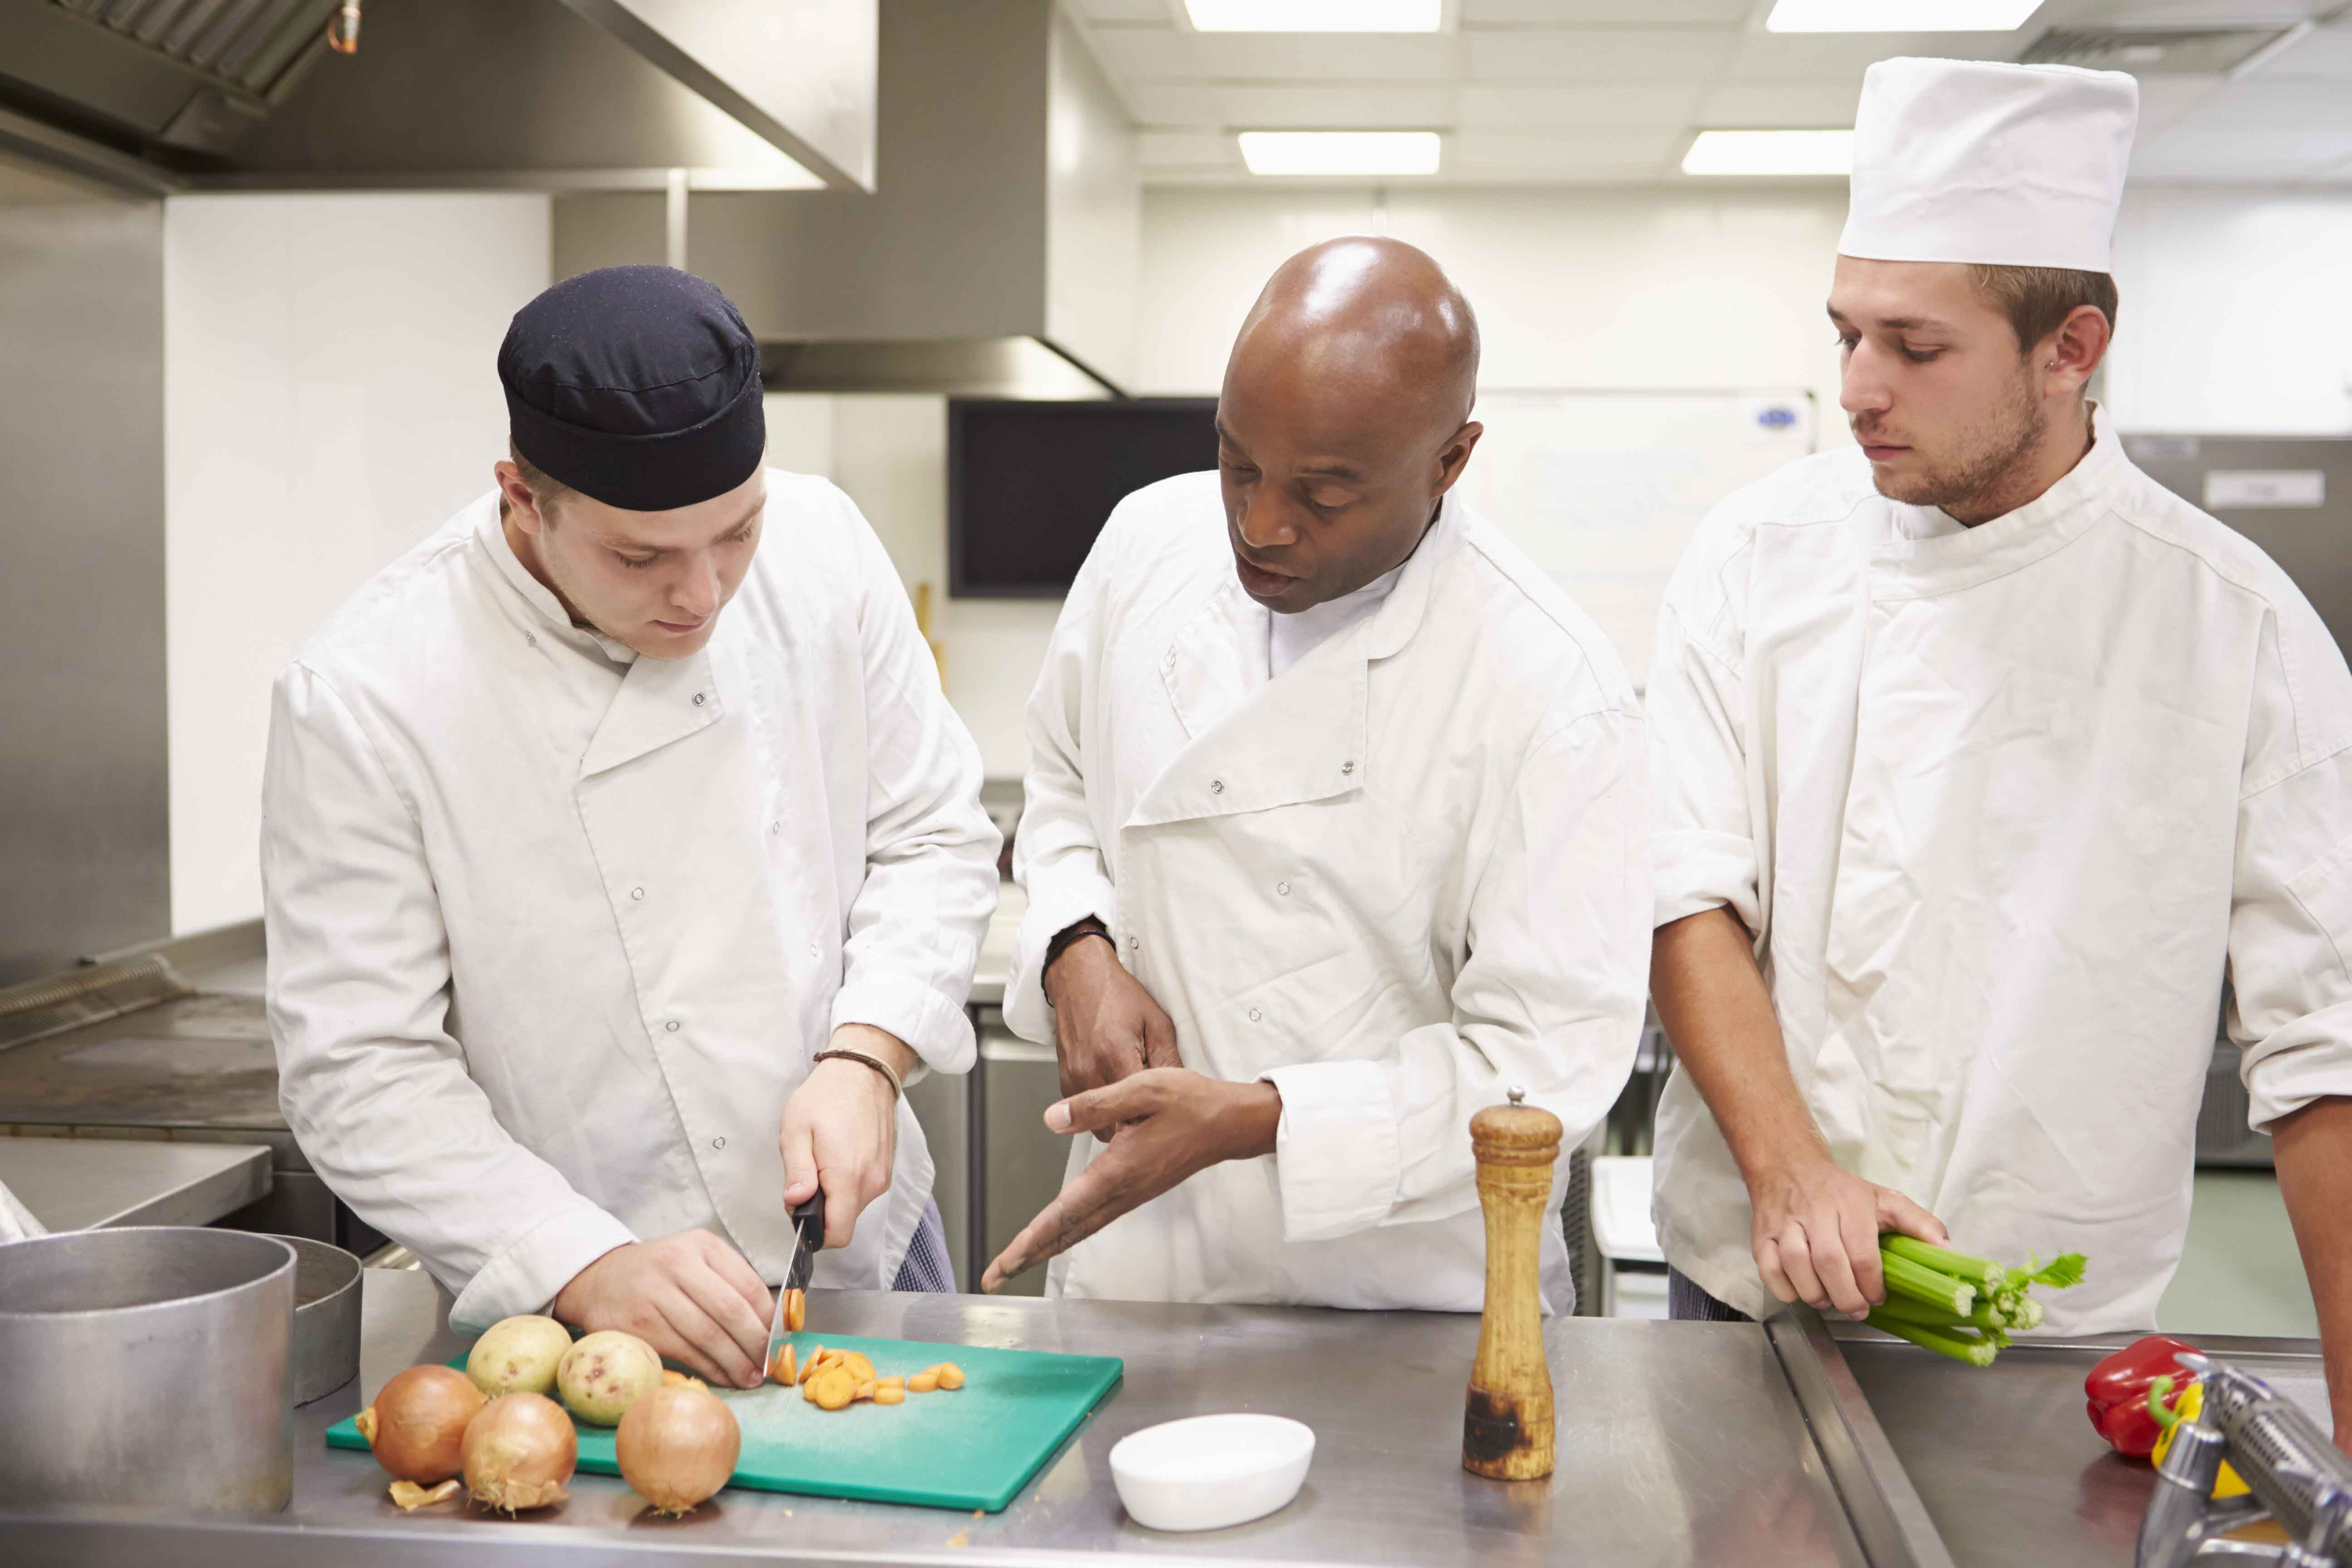 ayudante de cocina en colectividades 170 horas normabasica